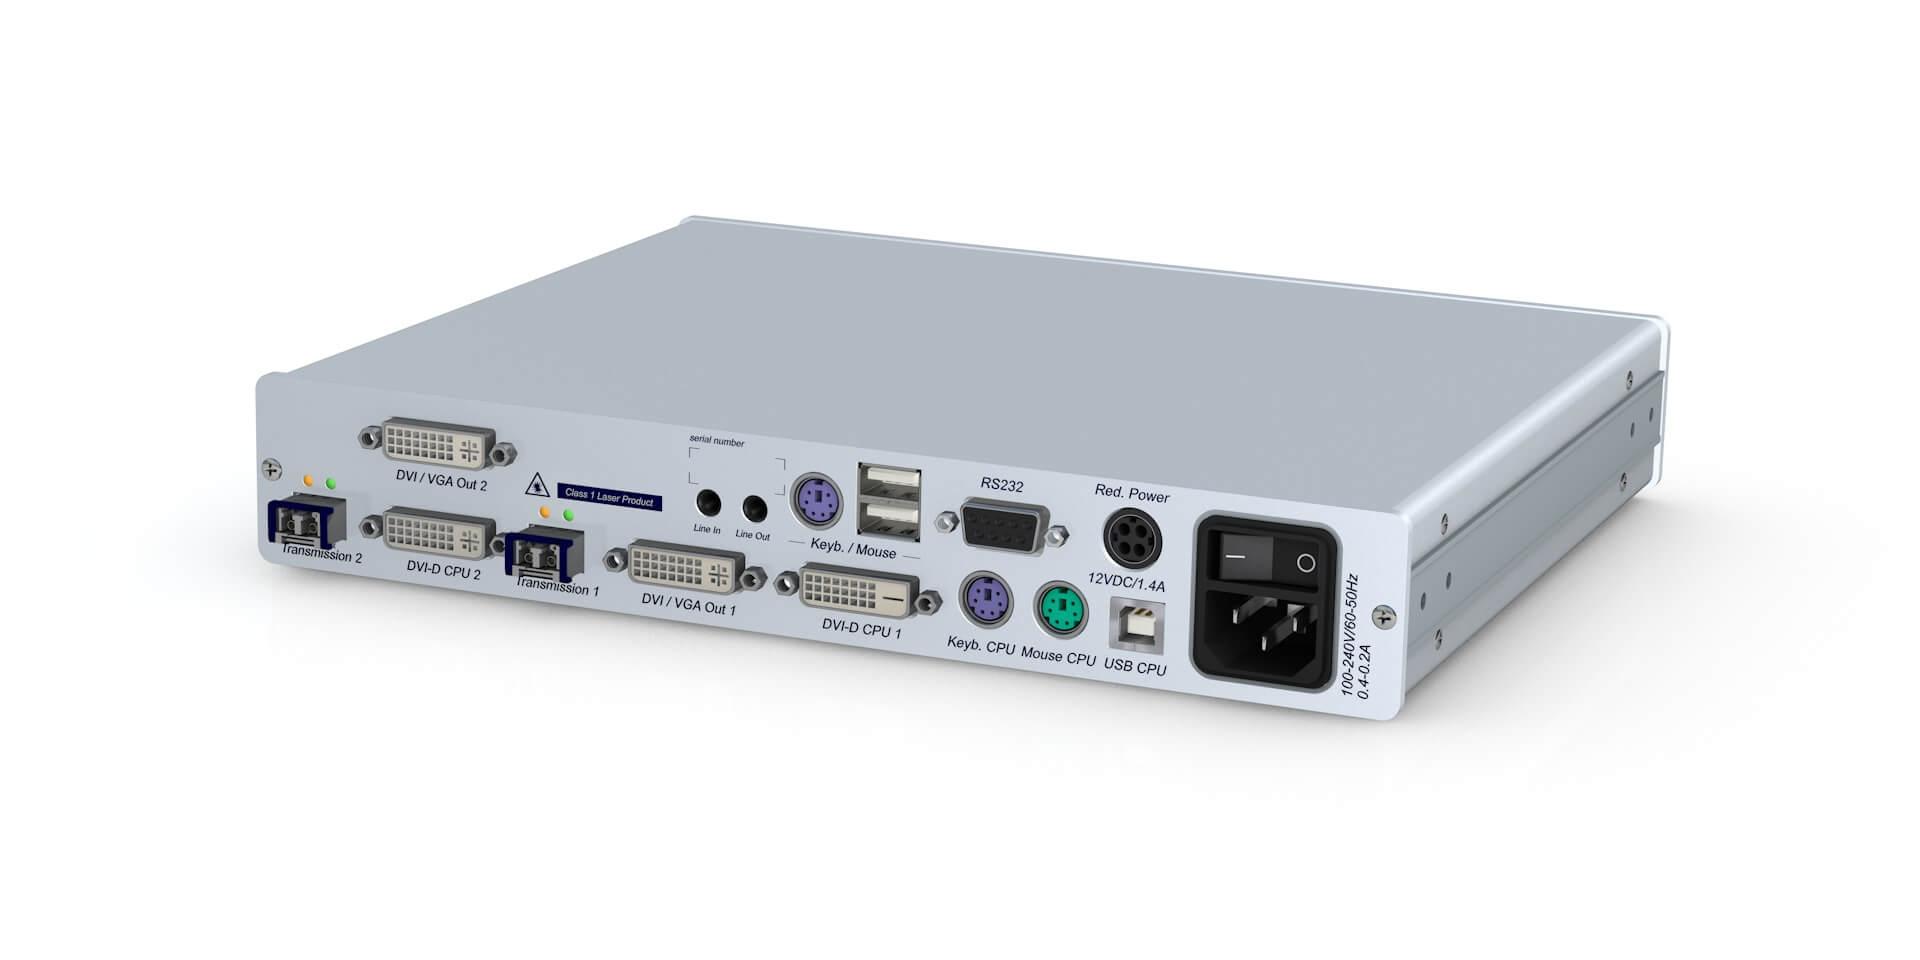 GDSys DVI-Vision Fiber MM MC2-ARU2 Extender - Receiver Con - Single Rx 2xDVI-SL PS/2-USB Audio RS232 USB 2.0 High Speed - Desktop